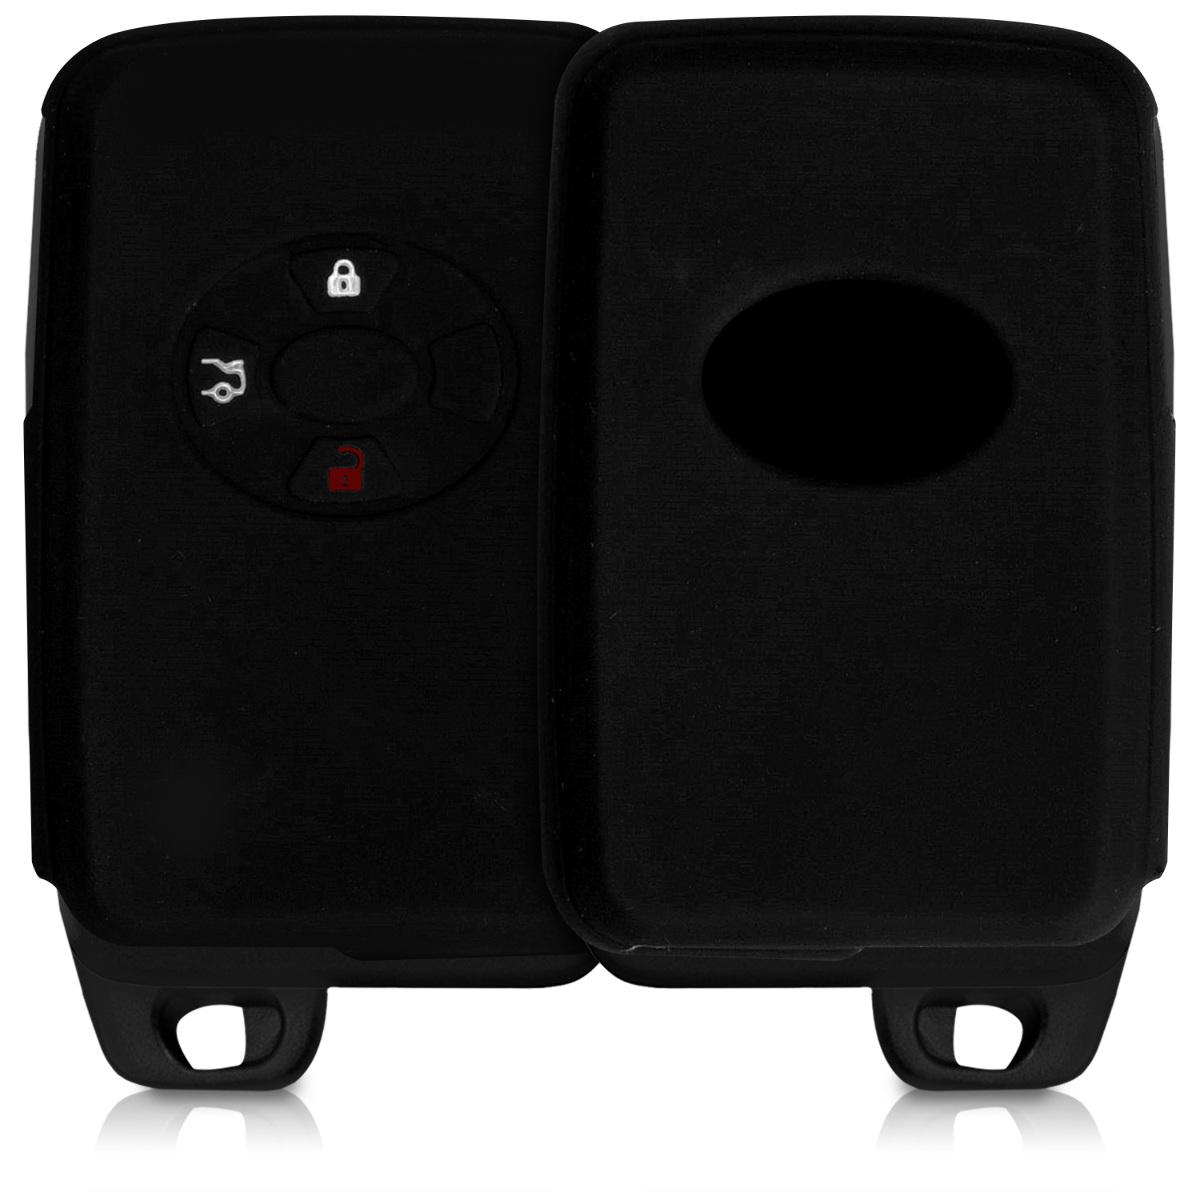 KW Silicone Θήκη Κλειδιού Toyota - 4 Κουμπιά - Black (42790.01)